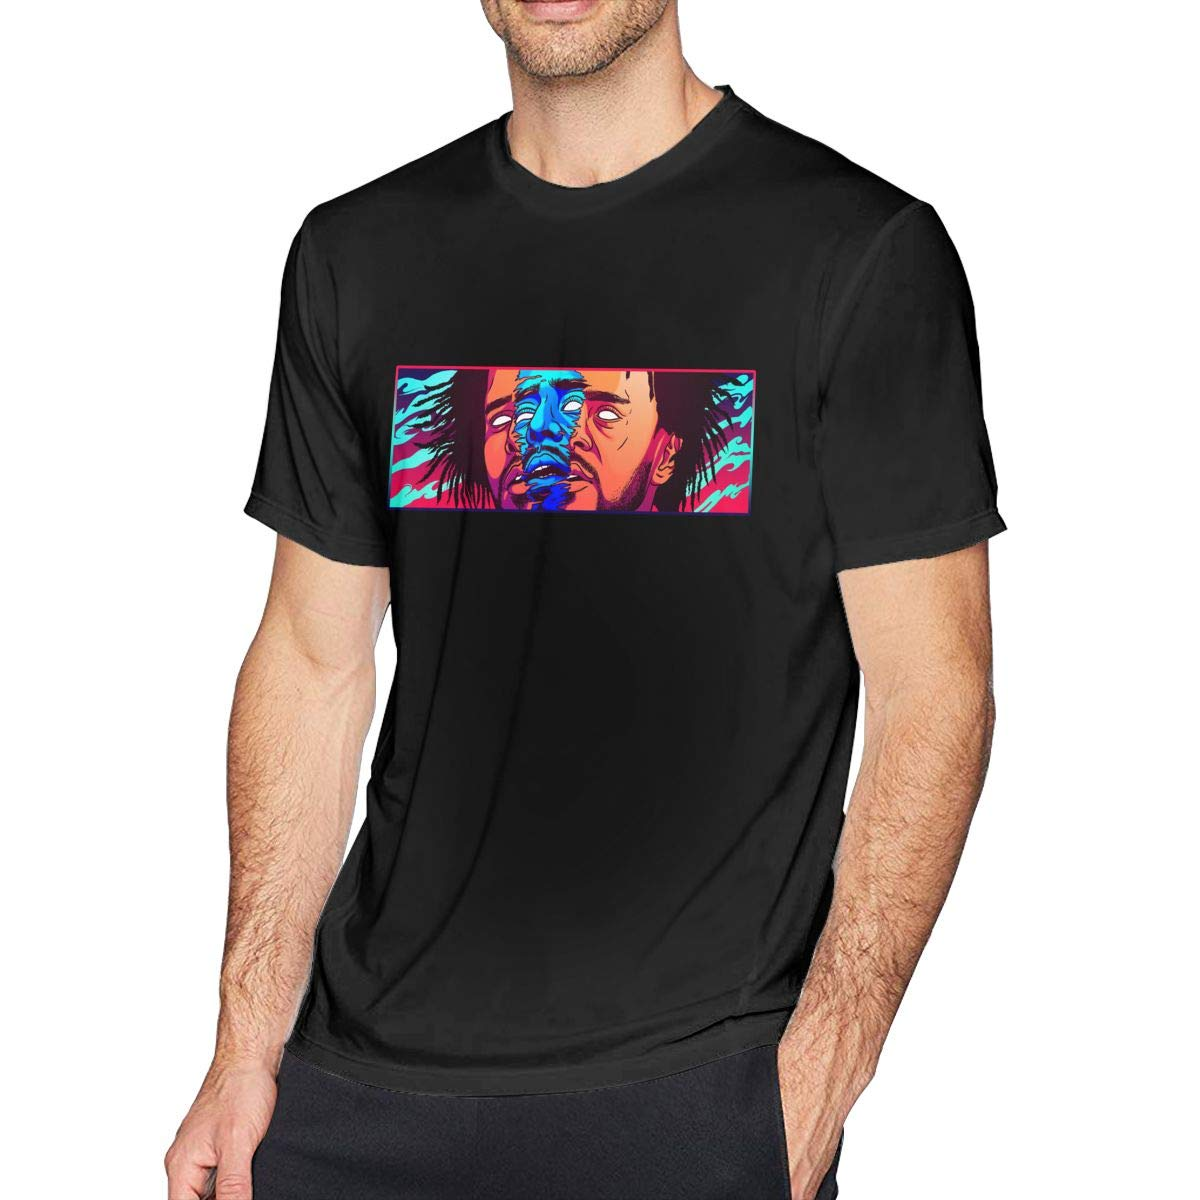 FengYuqi J Cole Man Classic Short Sleeve T-Shirt Athletic Cool Running T-Shirt Black